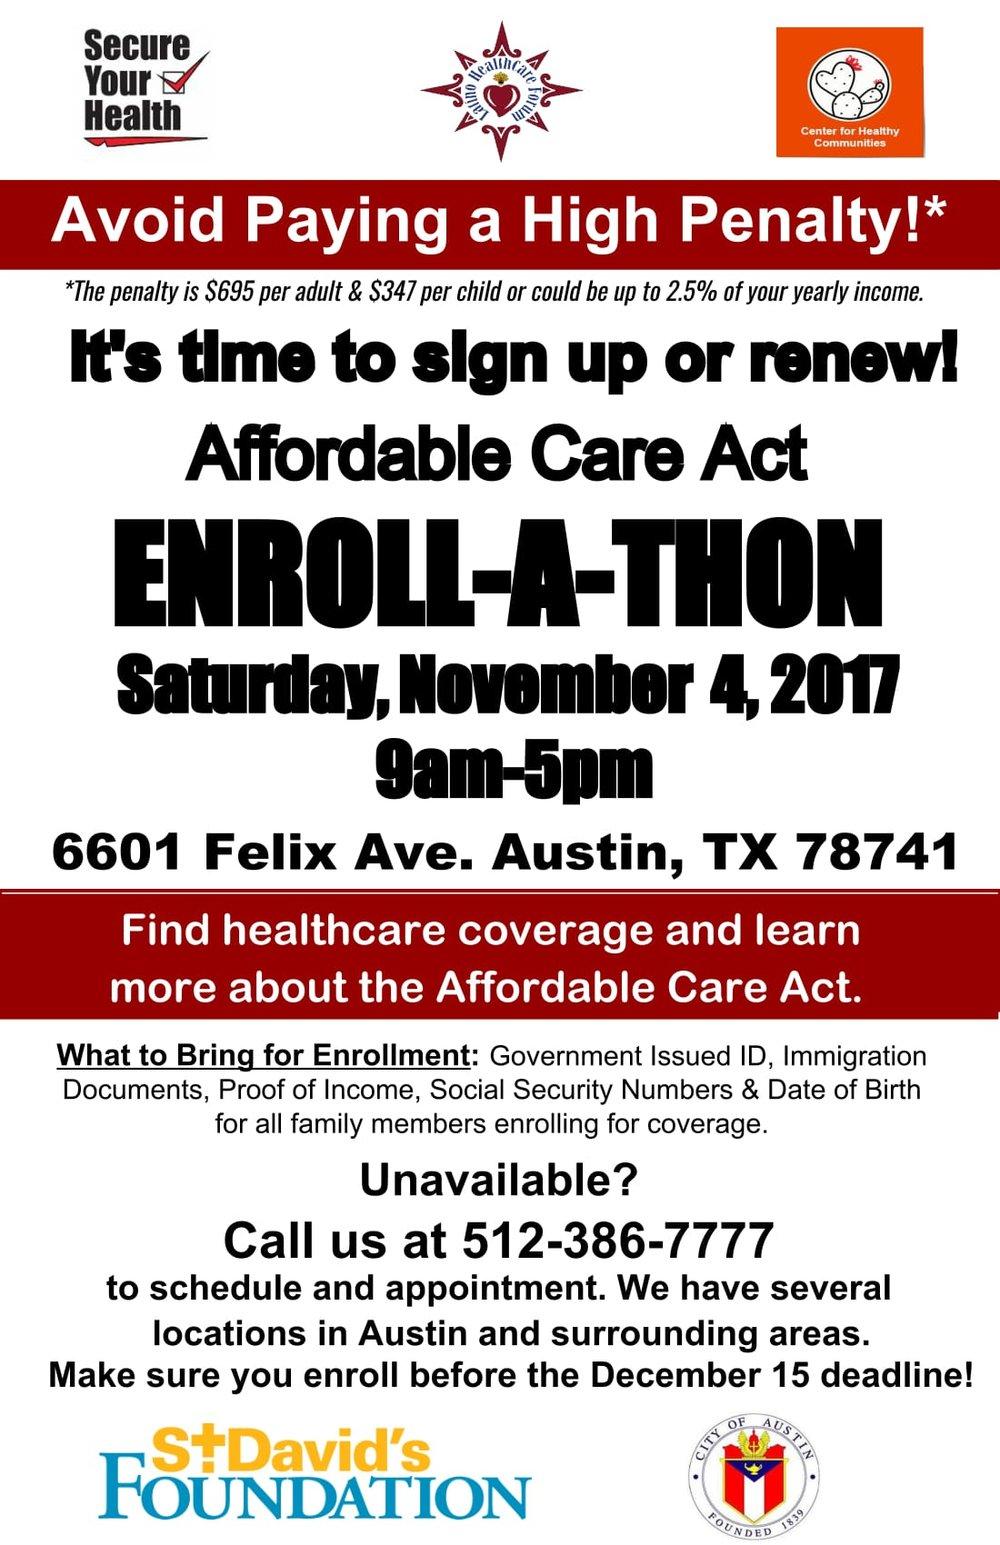 ACA Enrollathon Nov 2017-EN-1.jpg